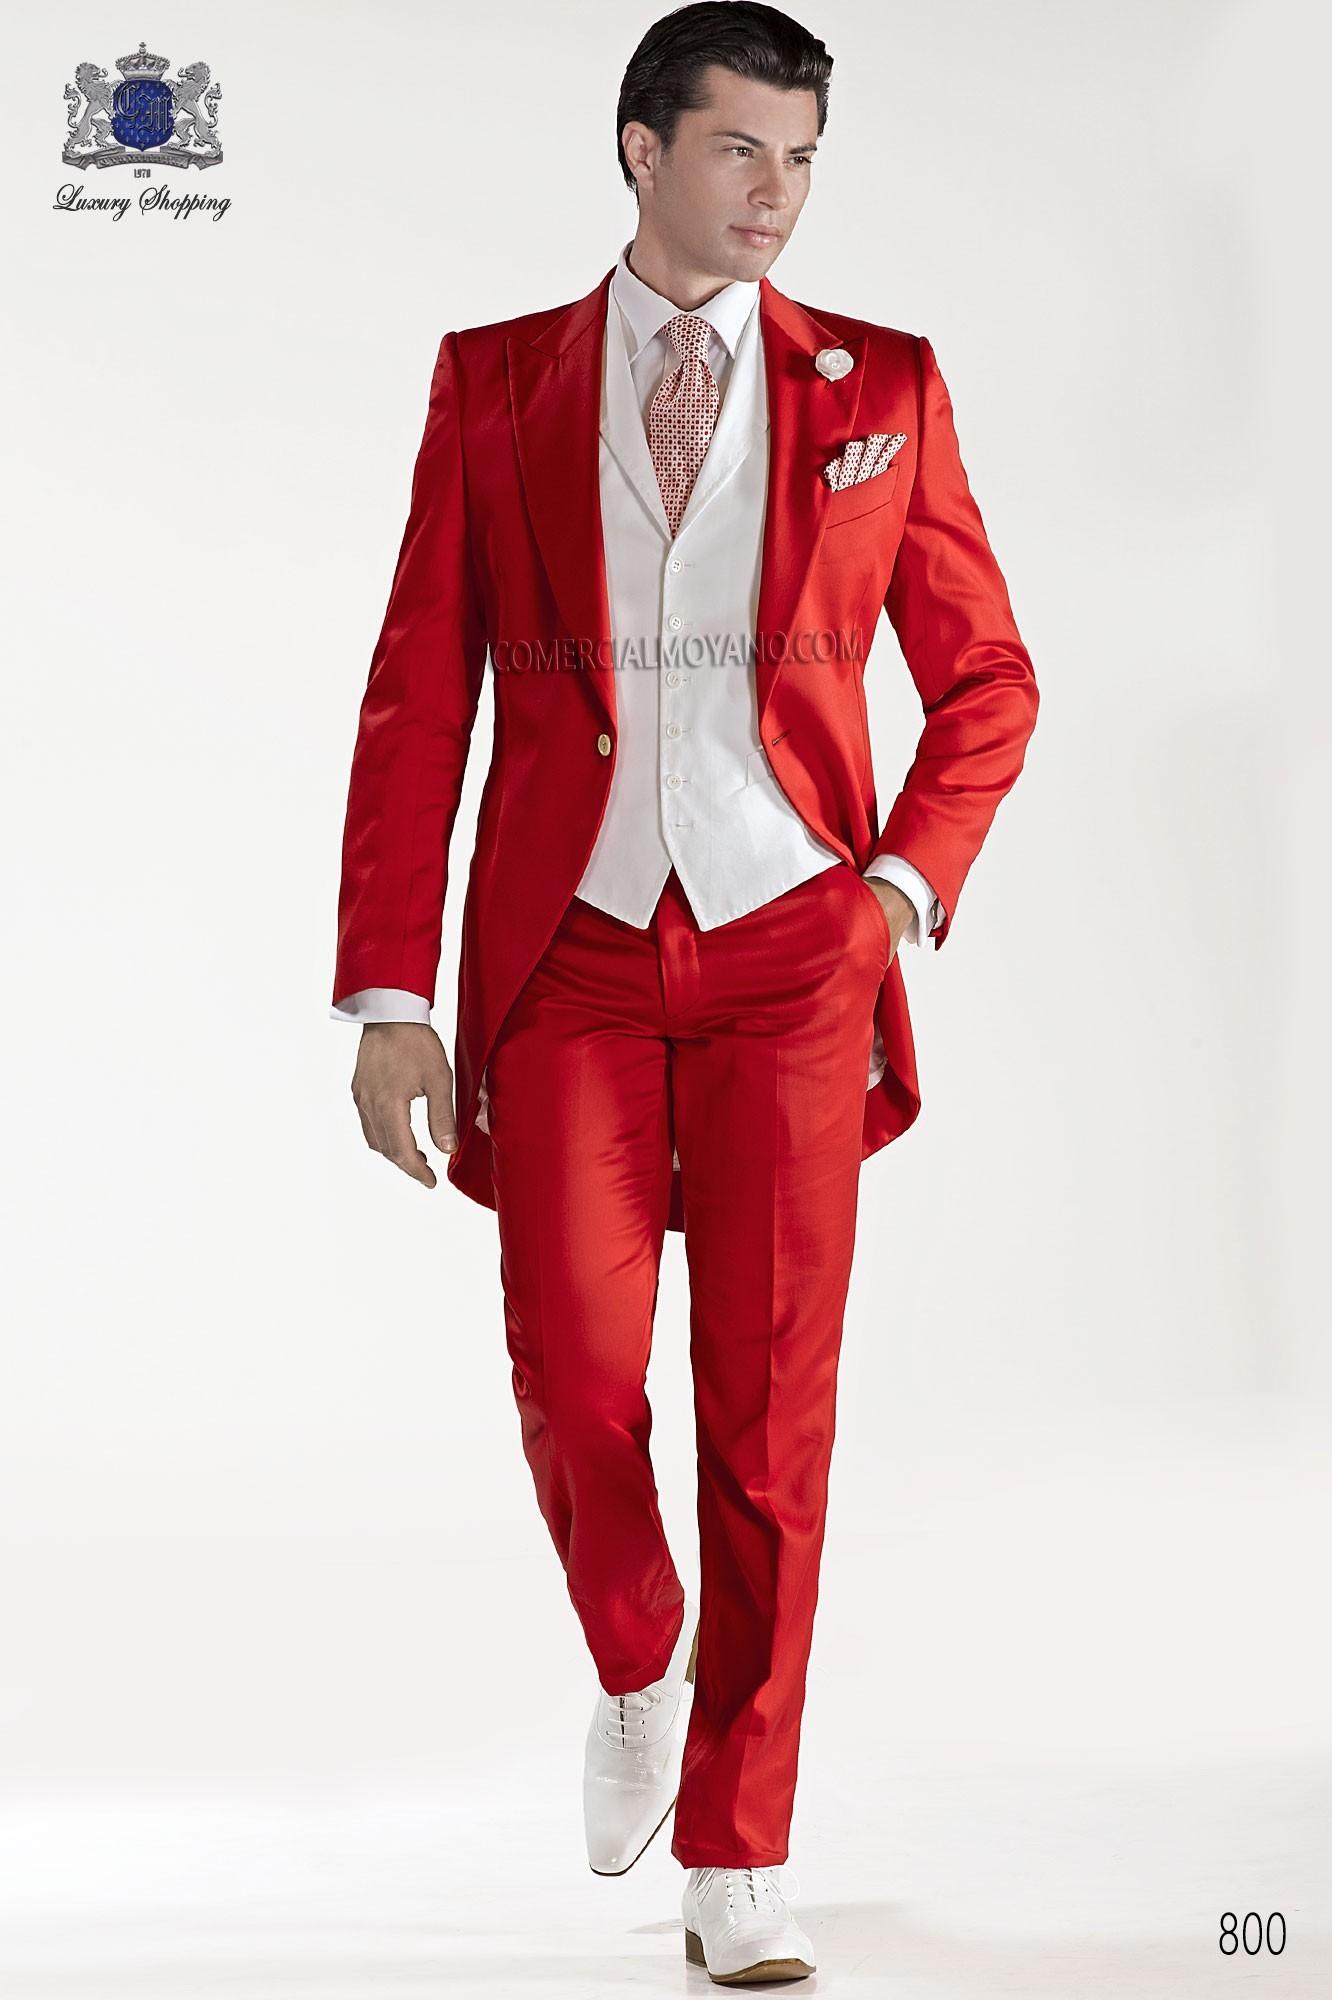 Traje de novio Hipster rojo modelo: 800 Ottavio Nuccio Gala colección Hipster 2017